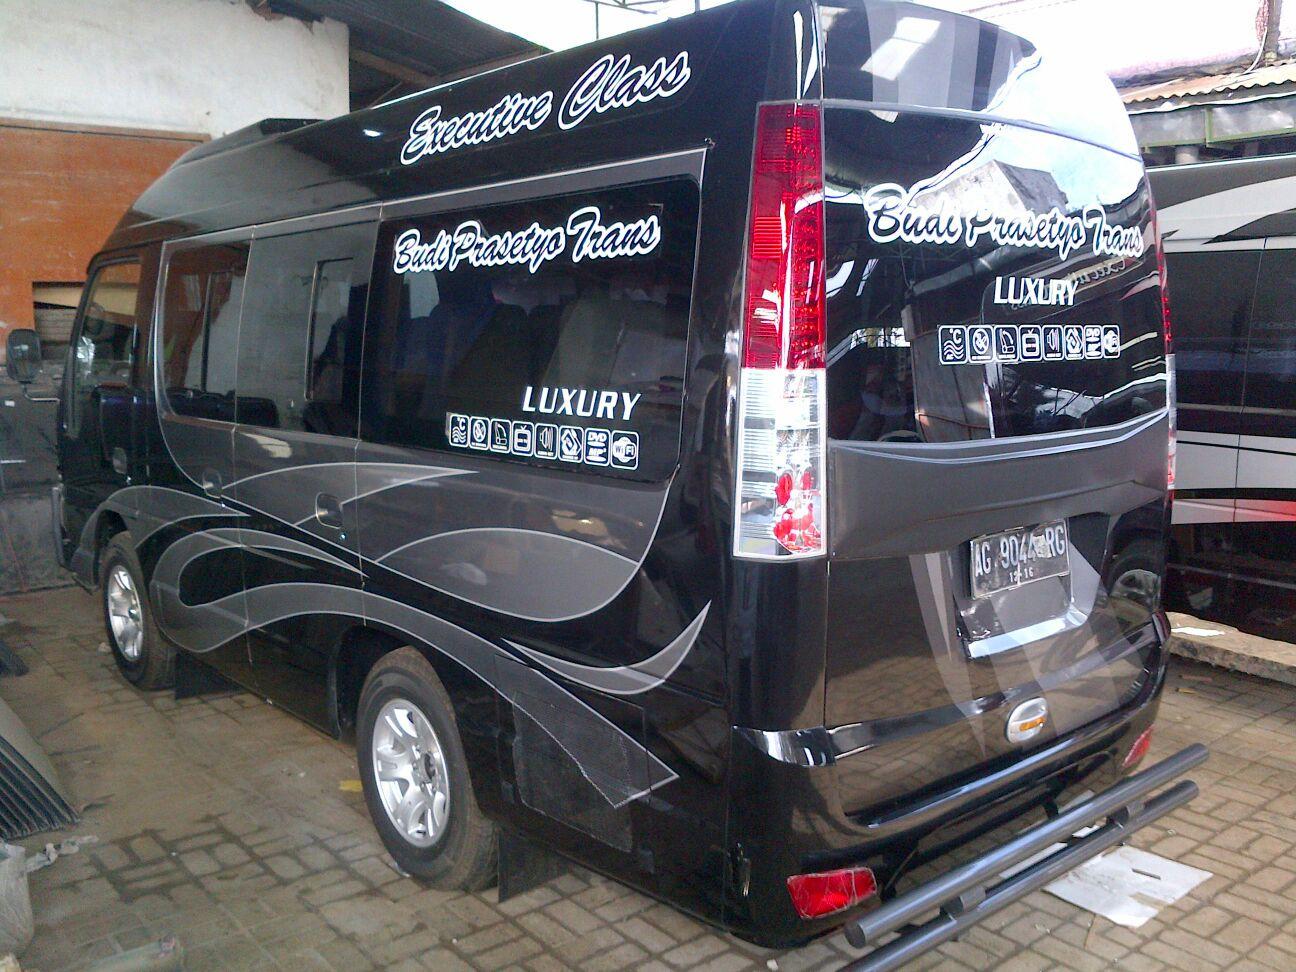 Dijual Kredit Truk Isuzu Elf Surabaya Jawa Timur 2016